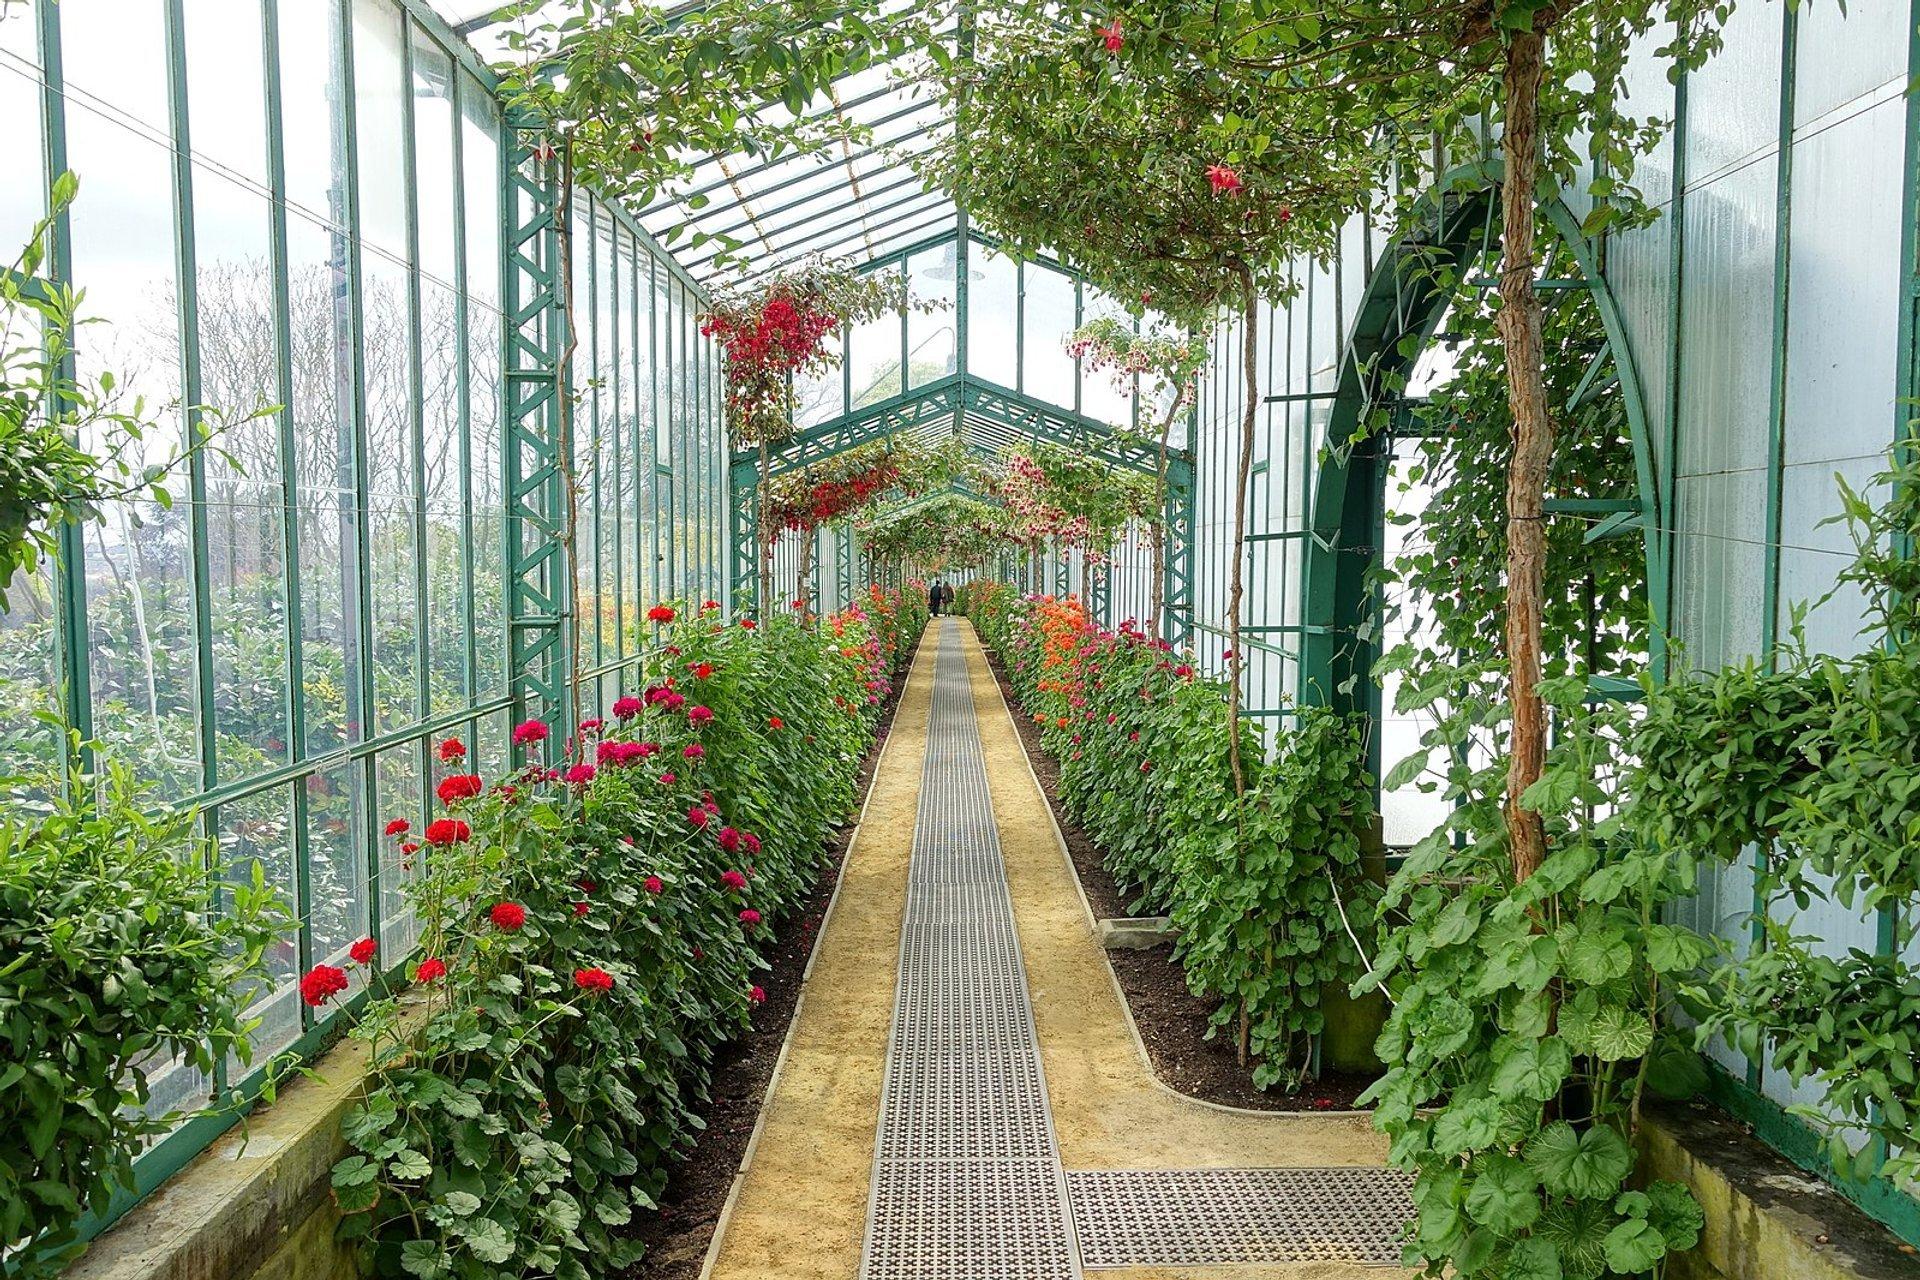 Royal Greenhouses of Laeken in Brussels 2020 - Best Time